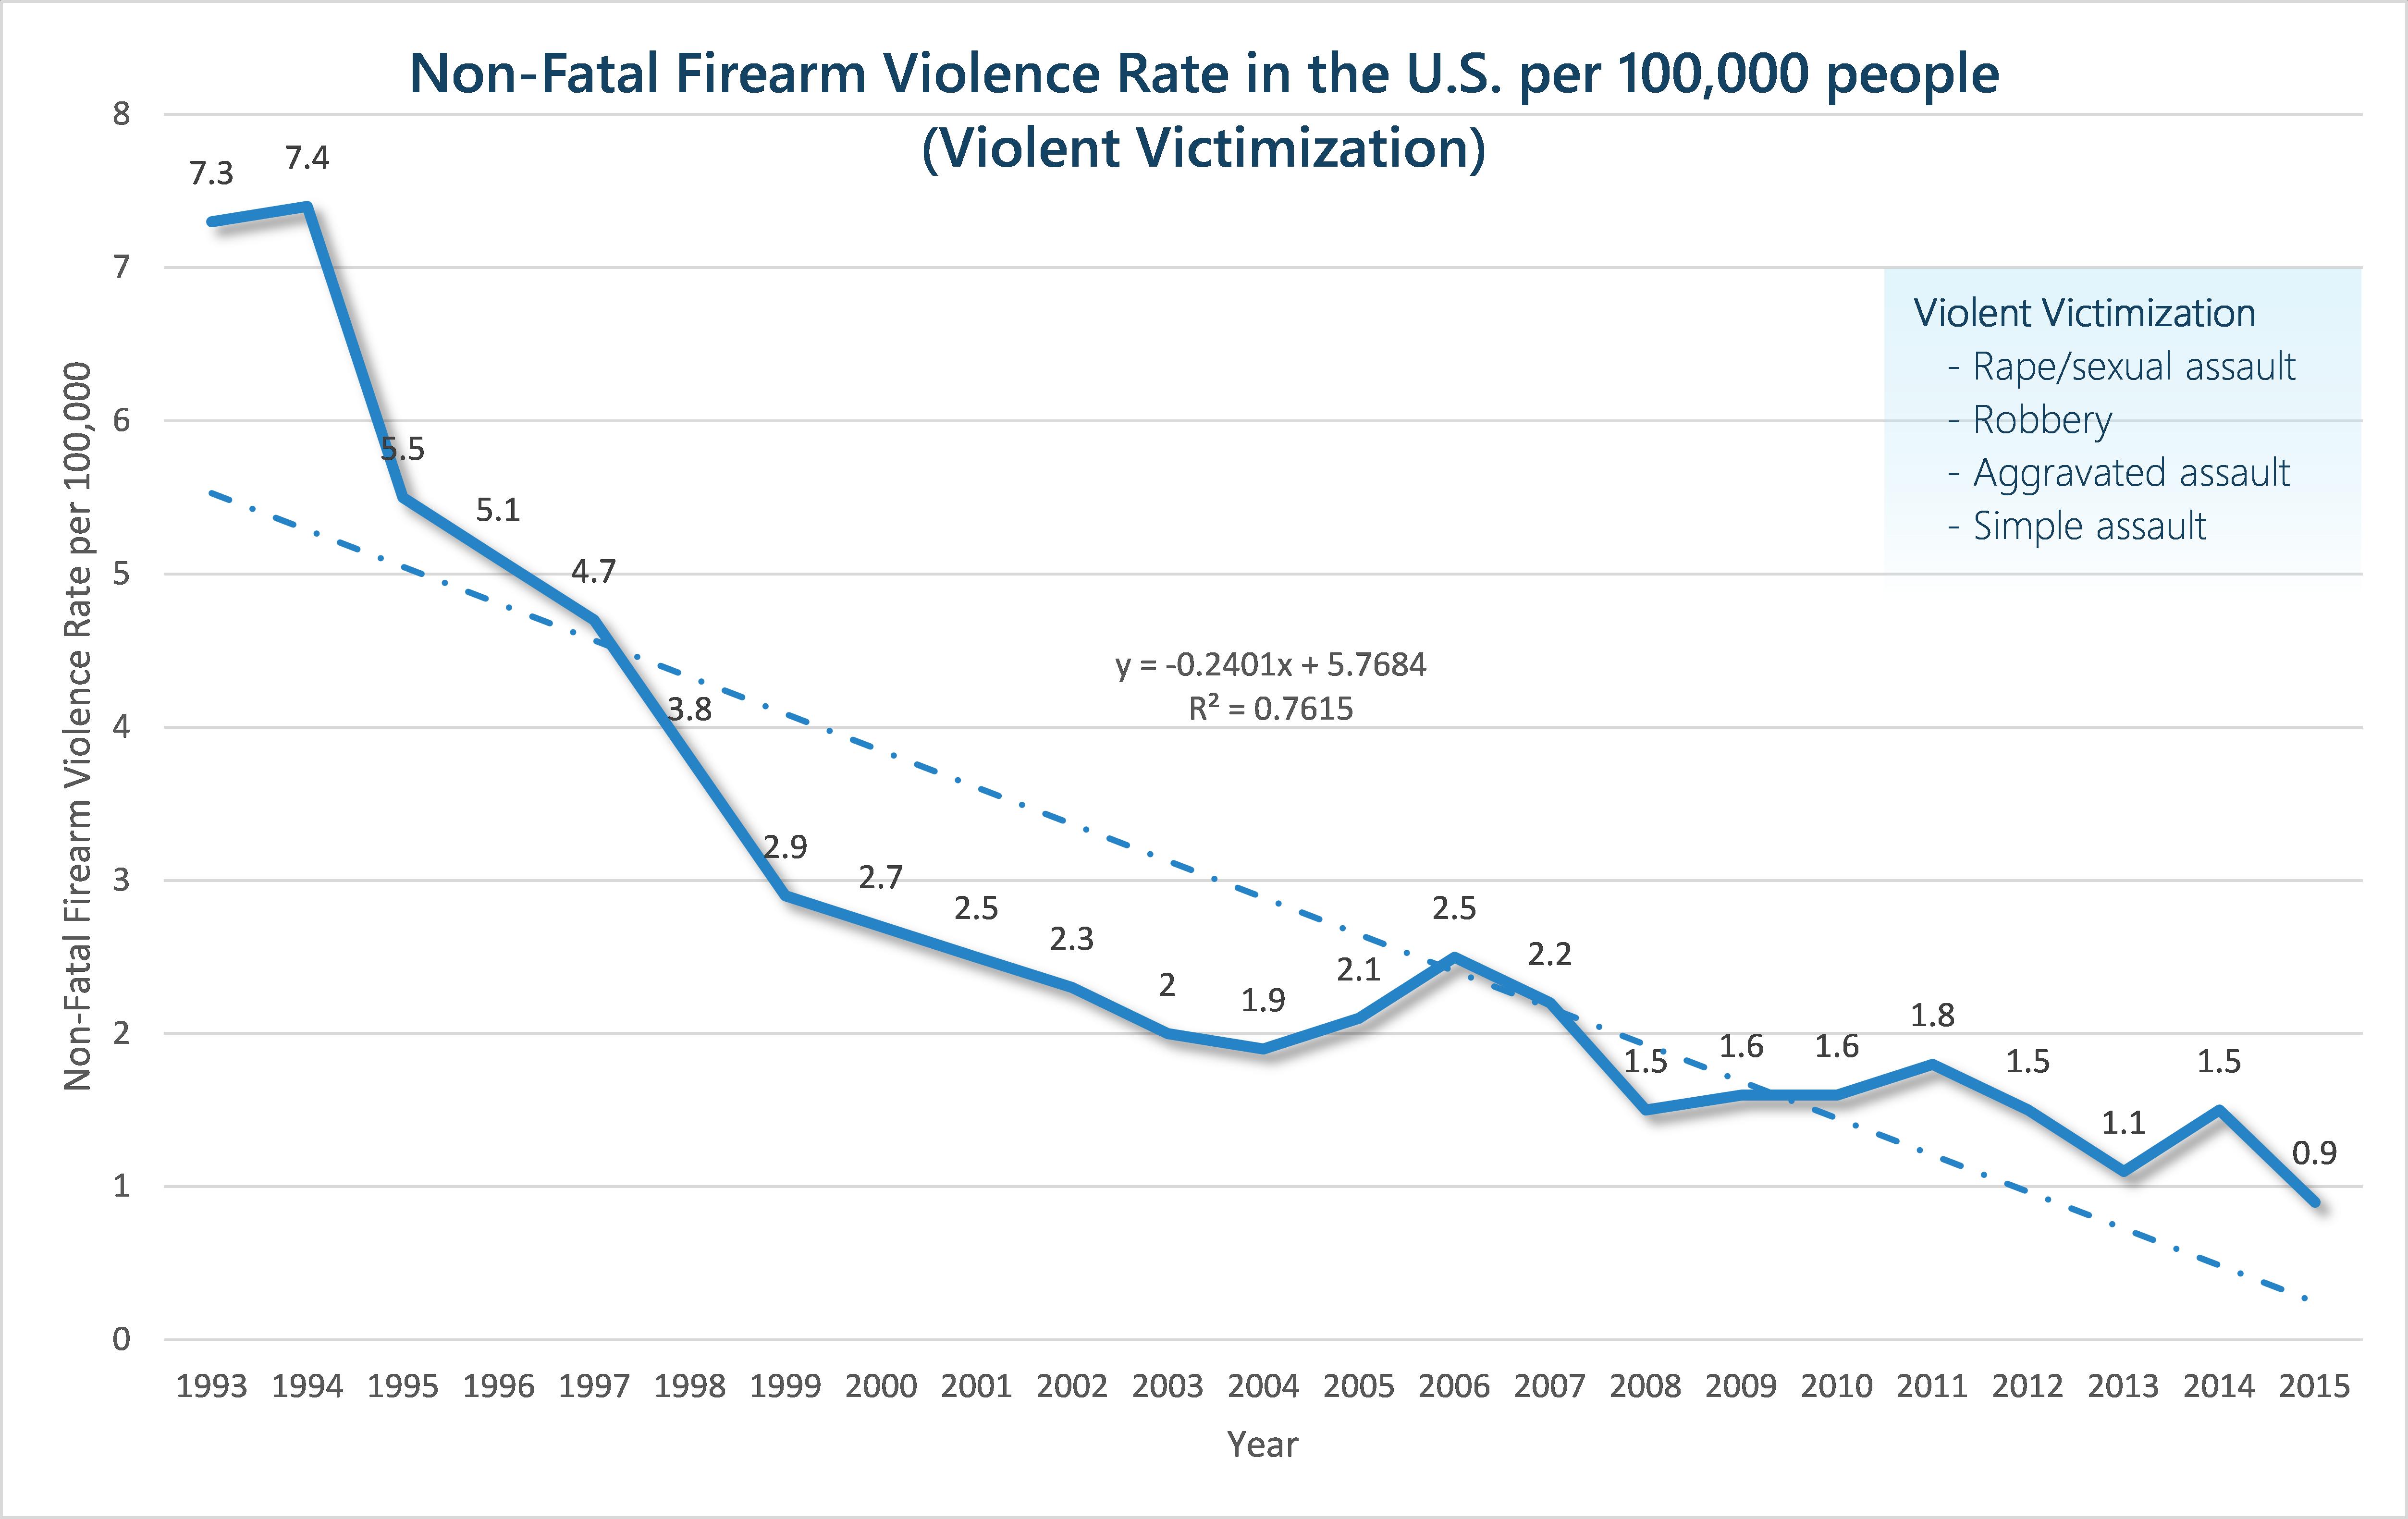 firearm_non_fatal_victimization_rate